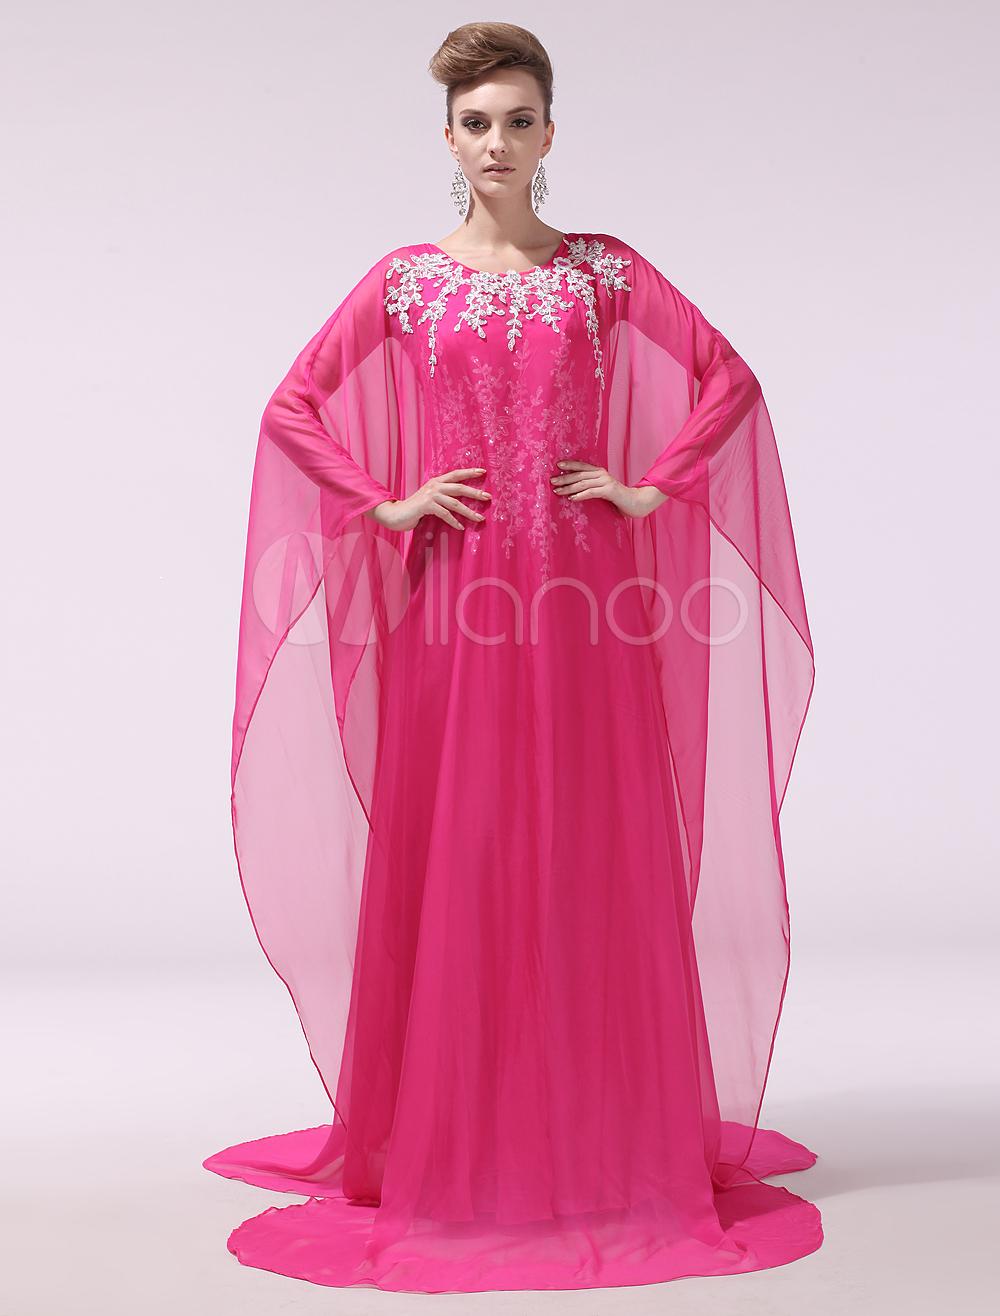 Chiffon Evening Dress Hot Pink 2 Piece Prom Dress V Neck Applique Sheath Party Dress with Train Milanoo (Wedding Evening Dresses) photo